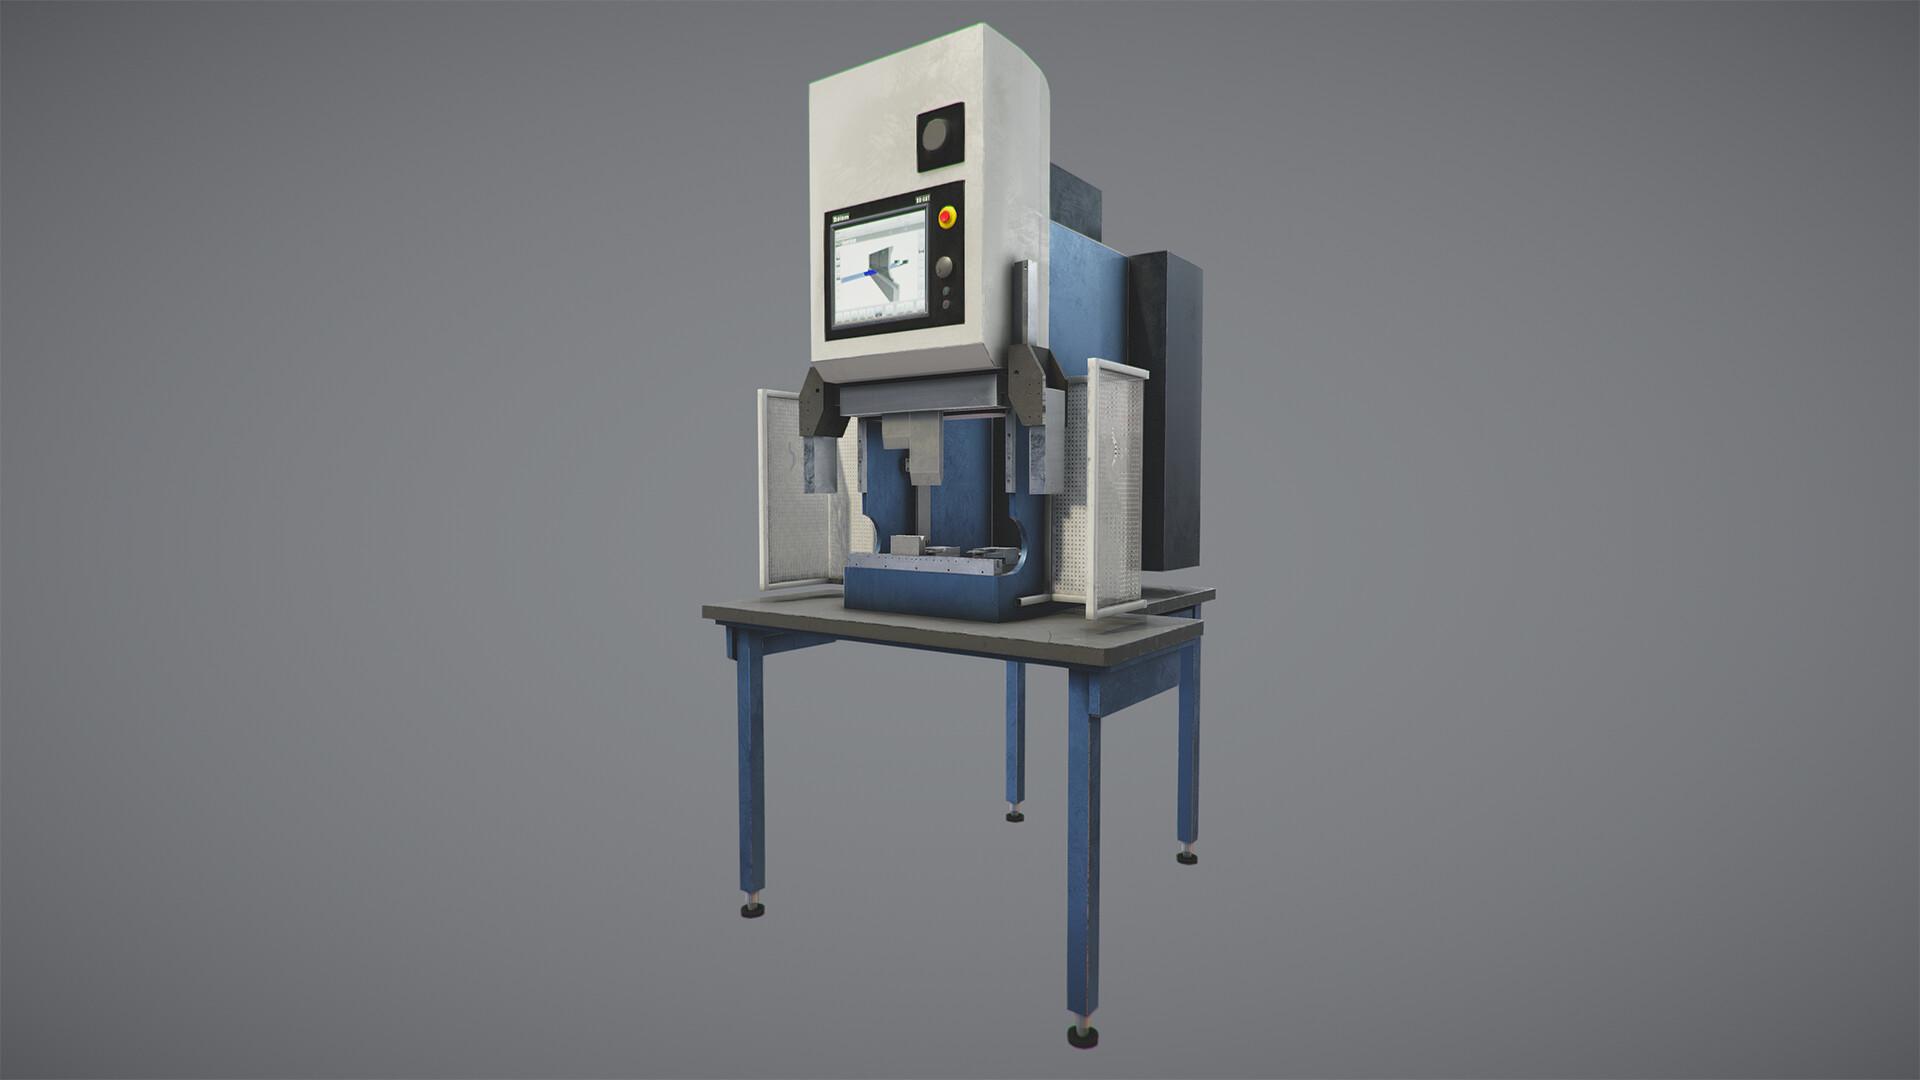 Rutger stegenga machinerypress 04